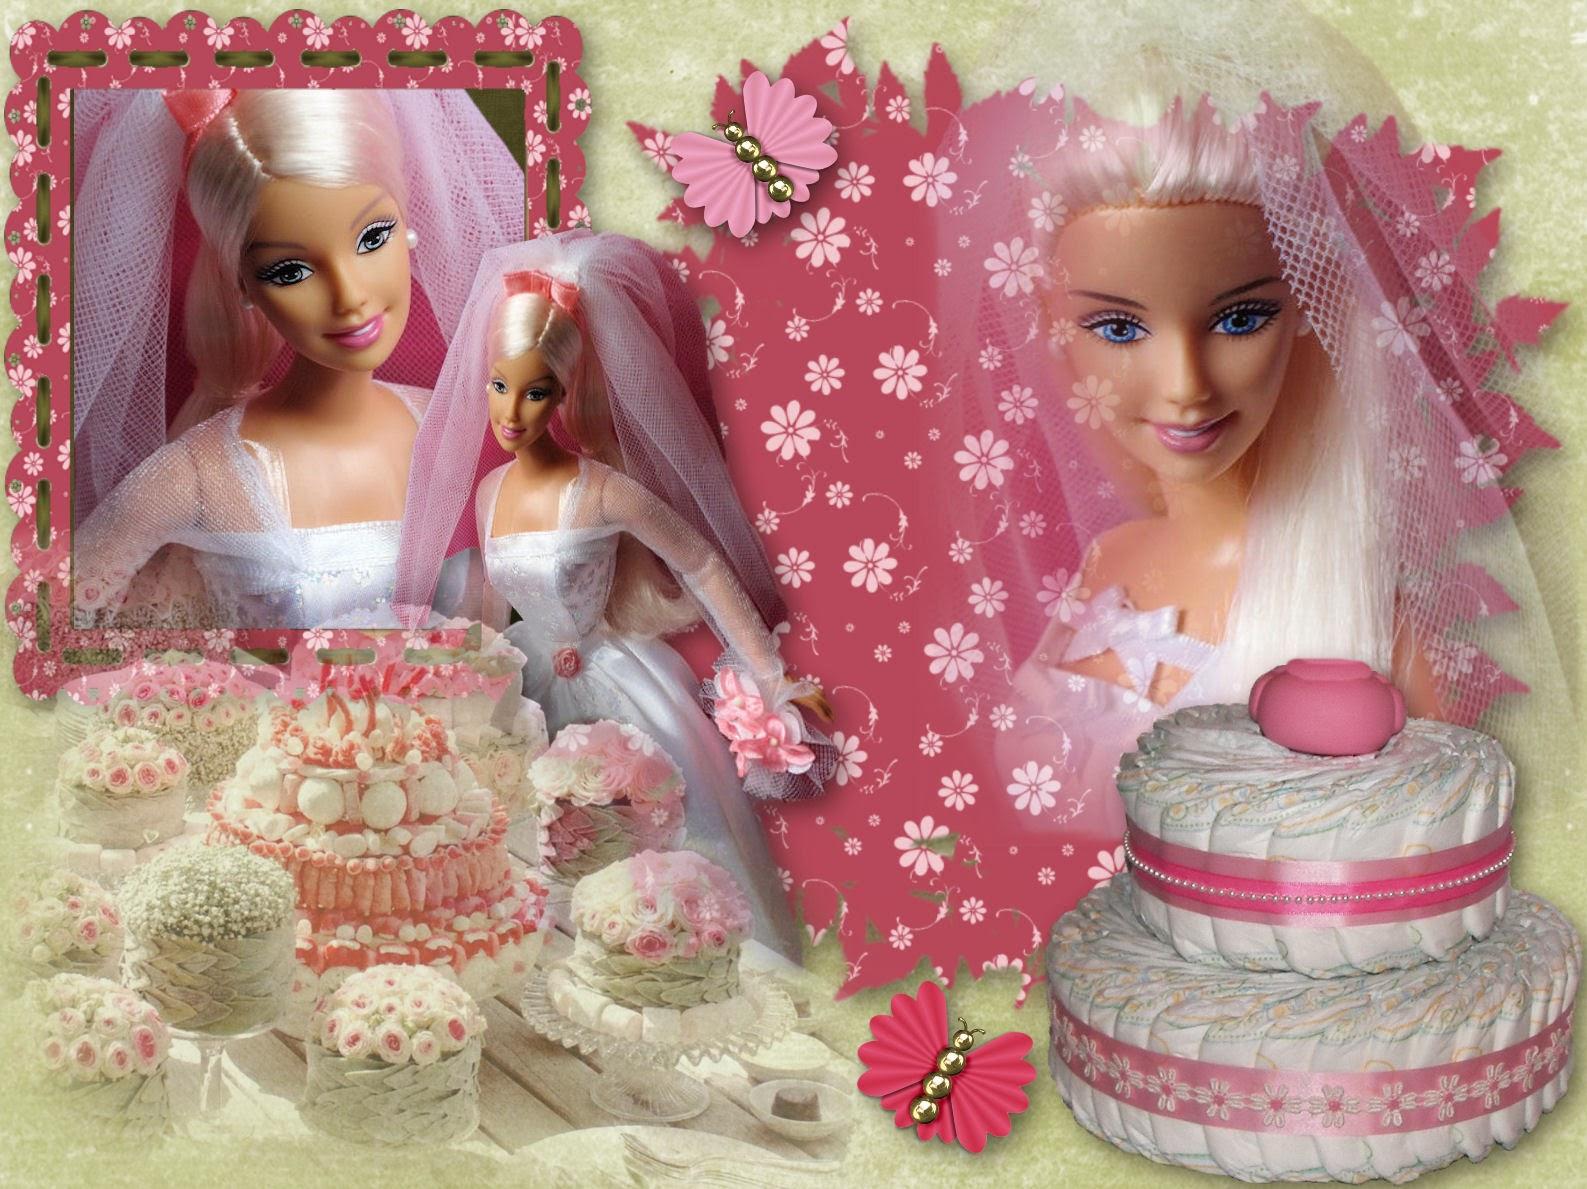 Barbie Dolls Hd Wallpaper Free Download: Barbie HD Wallpapers